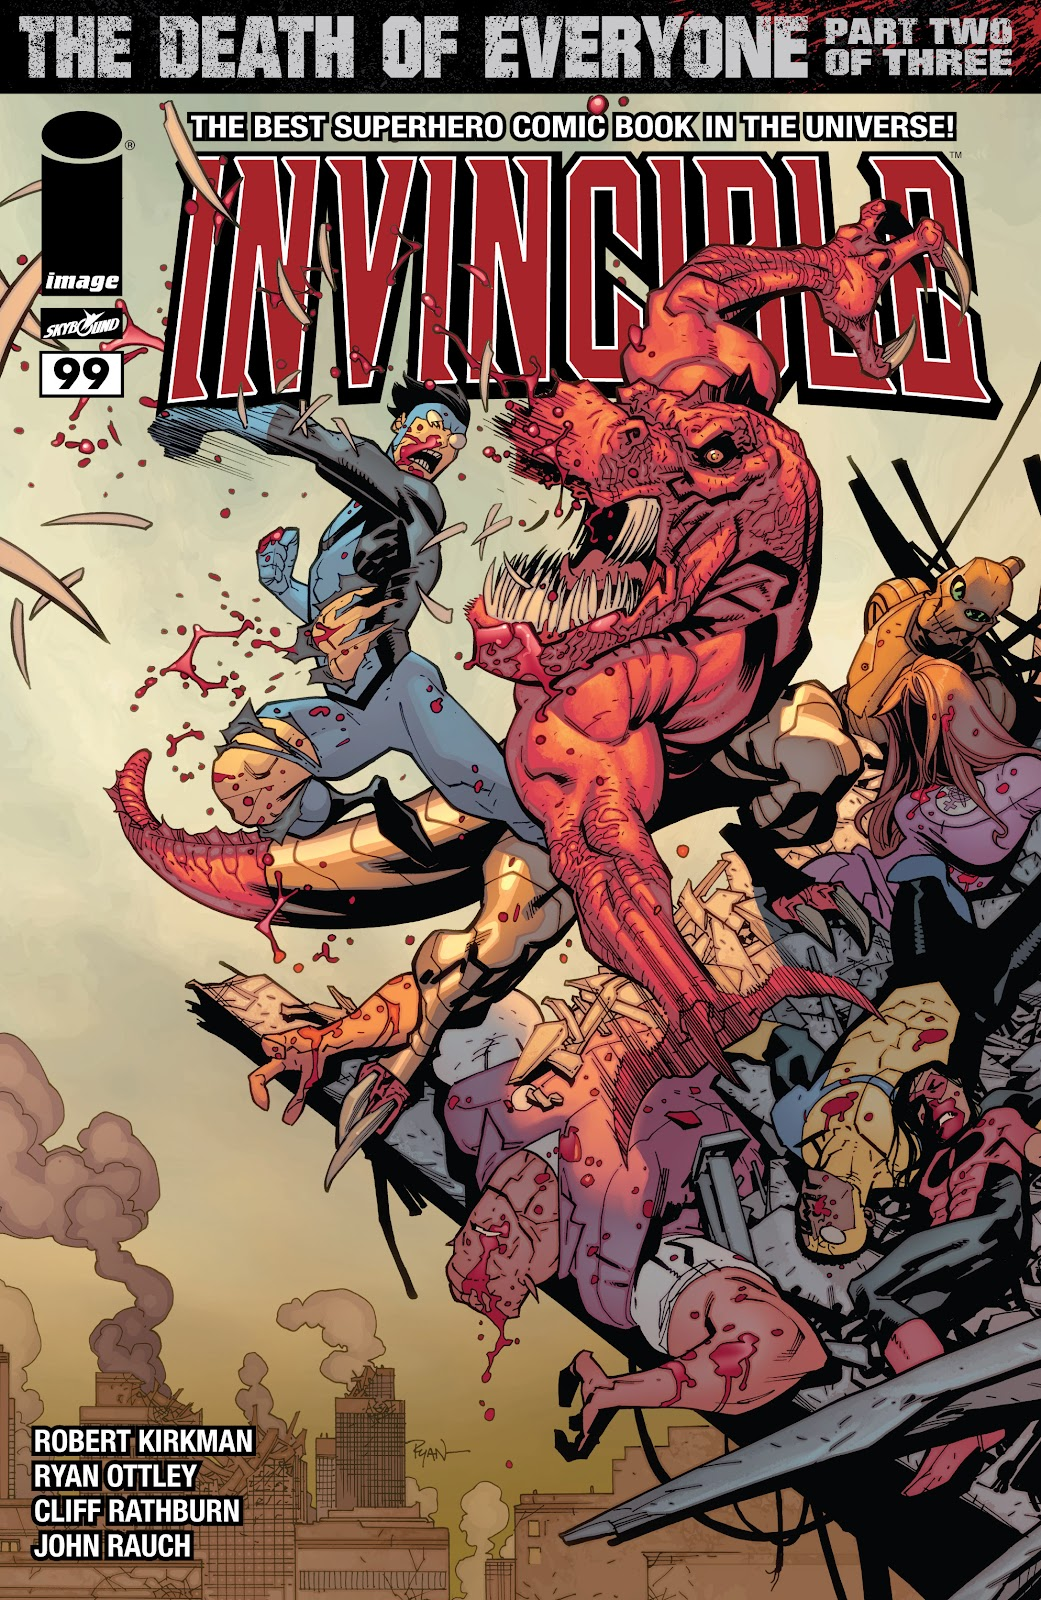 Invincible (2003) 99 Page 1